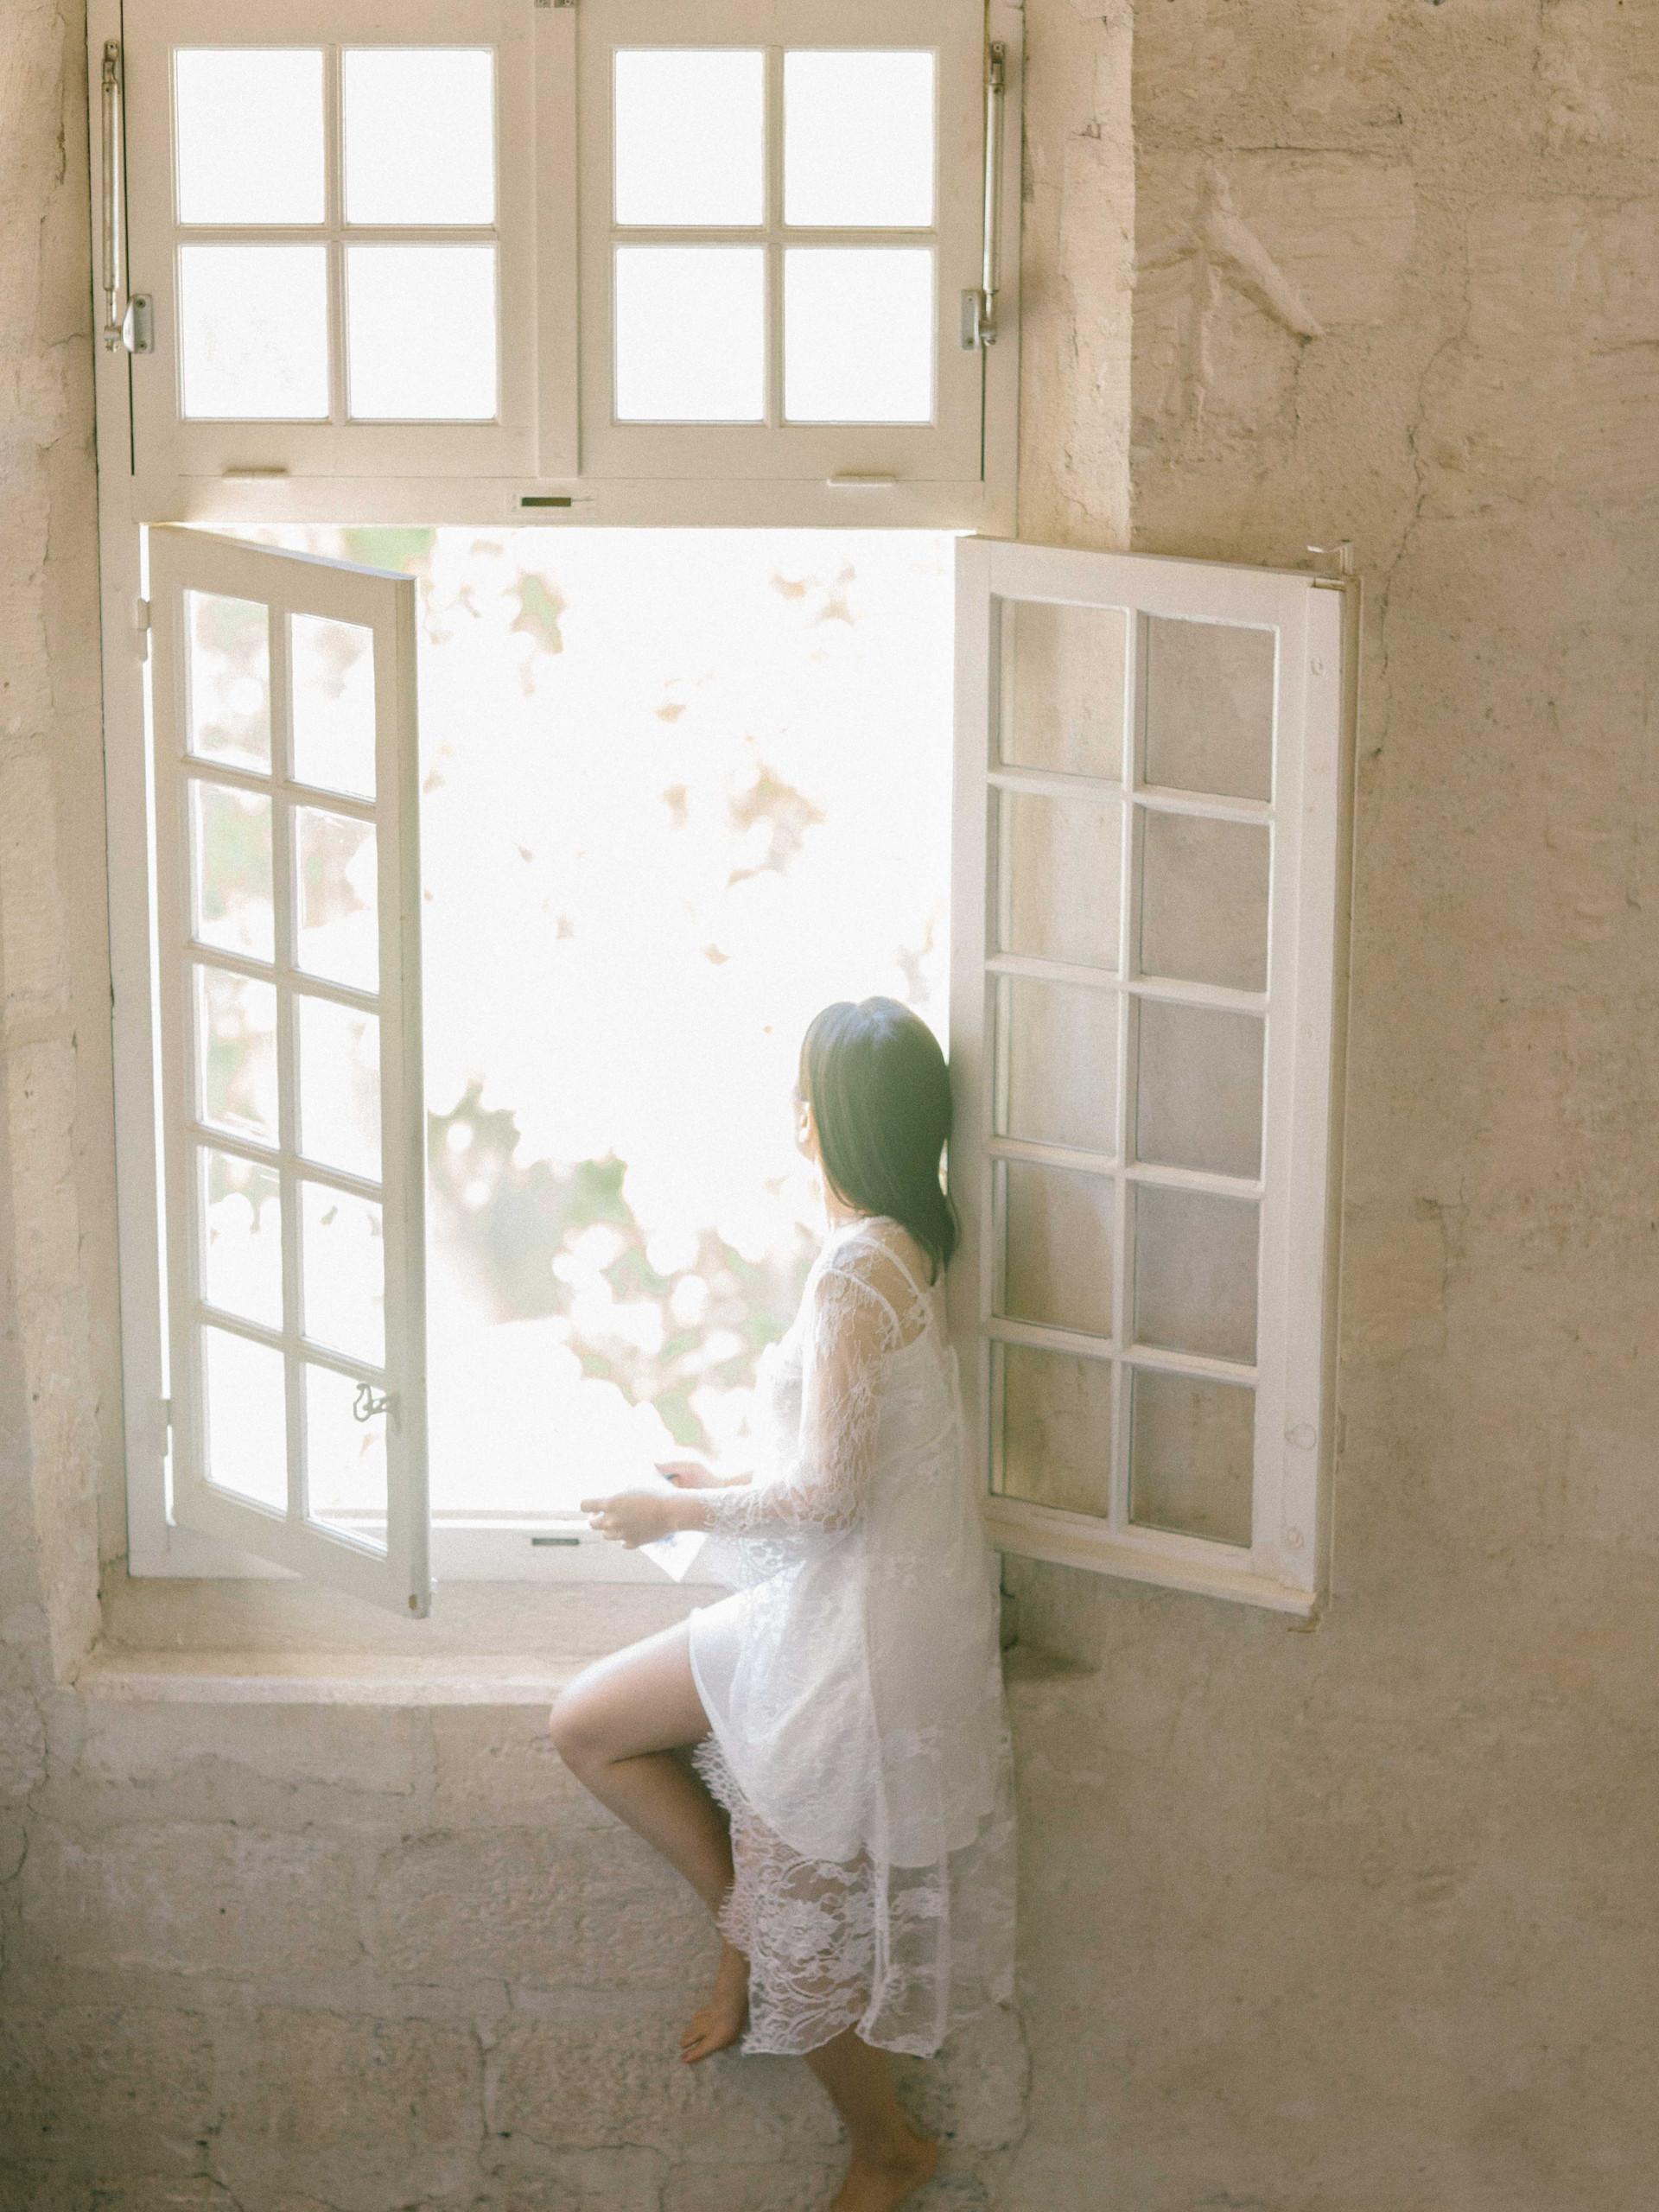 Lukas Chan Photo Lab - Ivy Solo - website-17.jpg